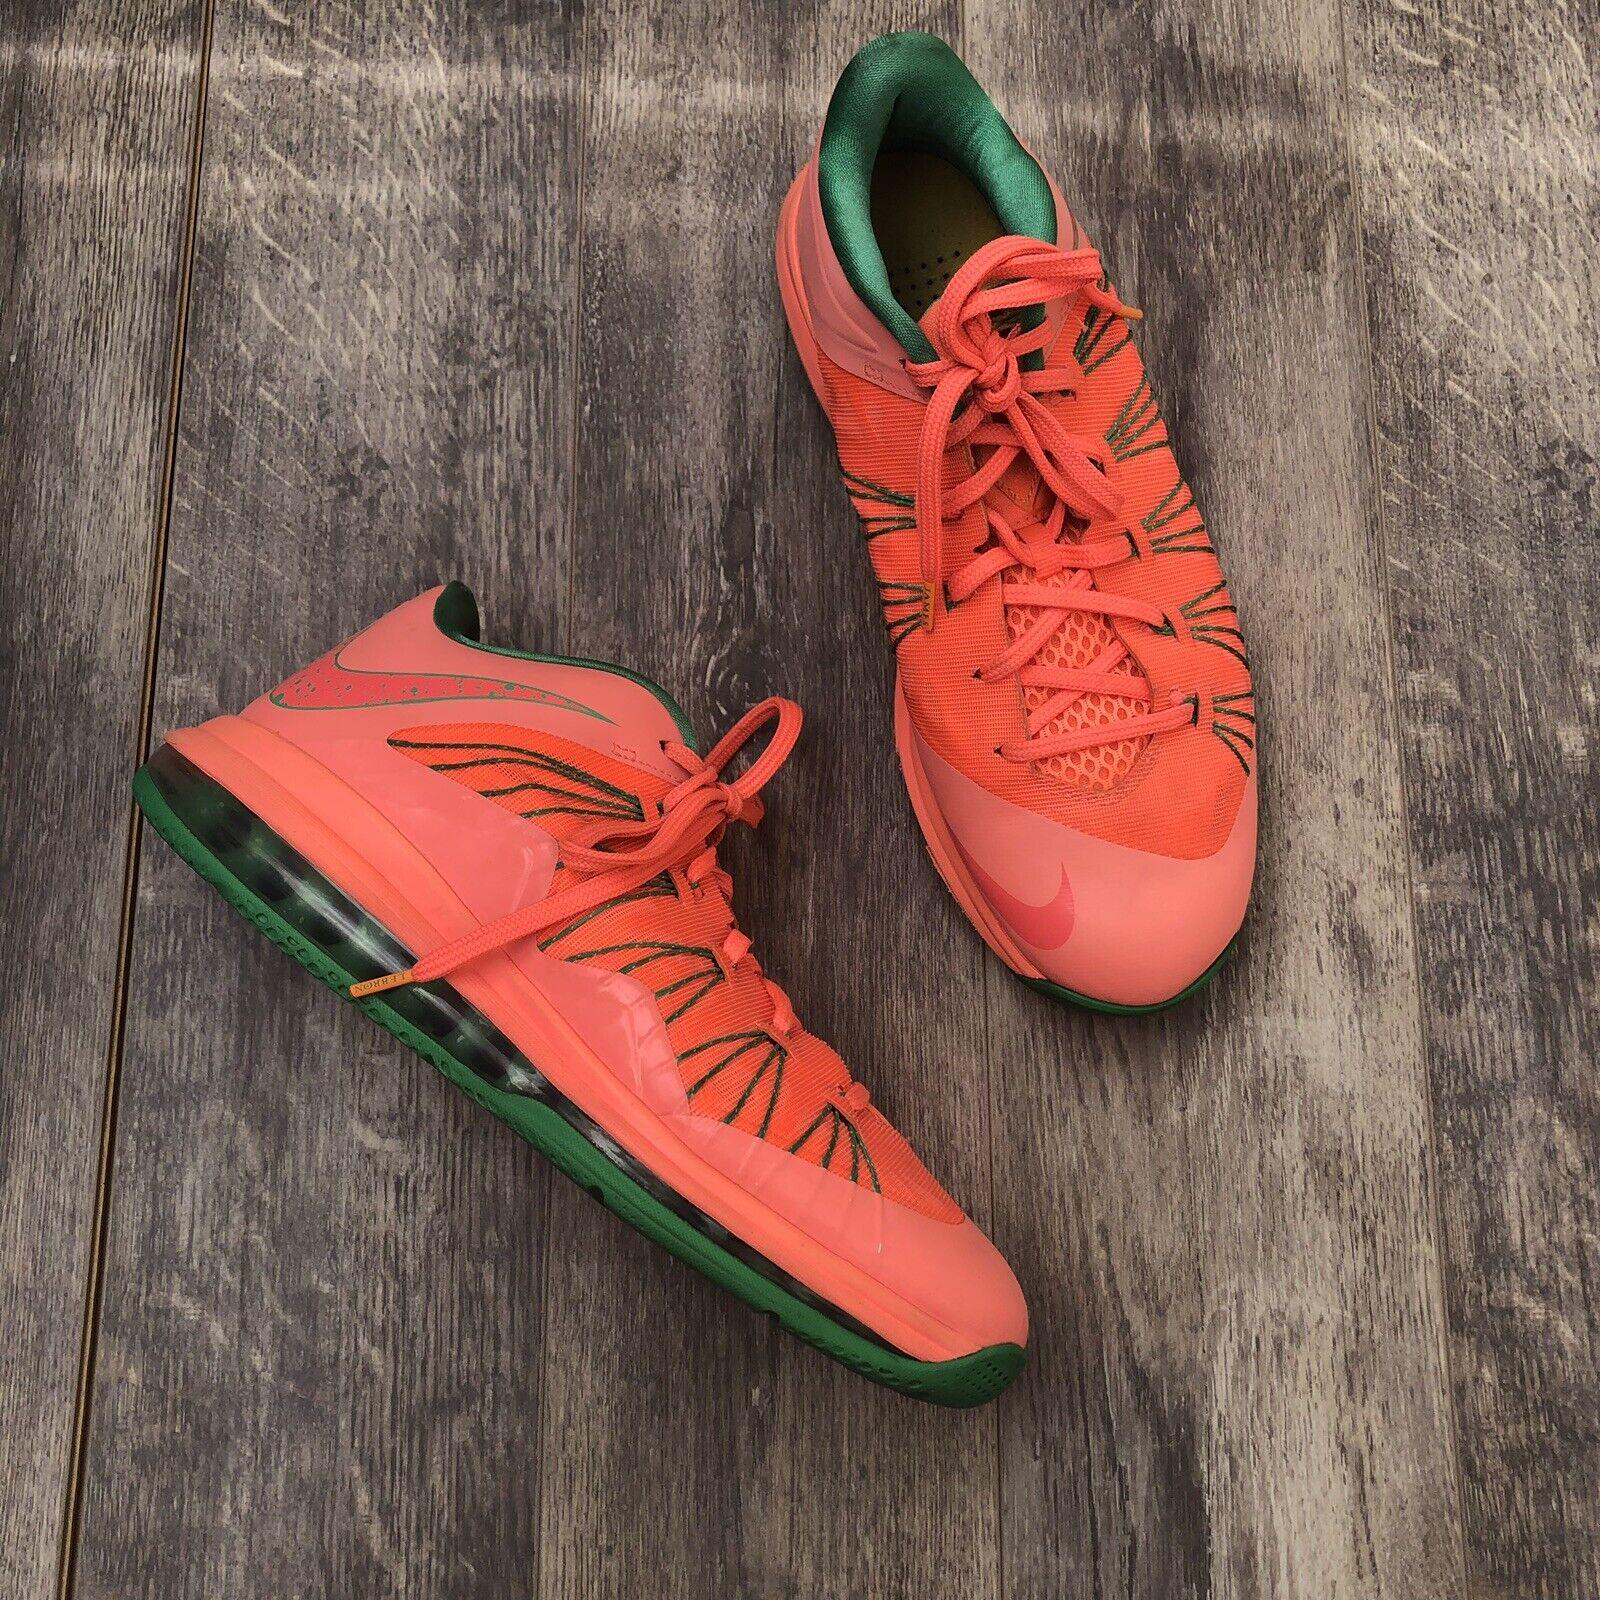 new concept afec1 60656 Nike Air Max Lebron X X X 10 Low Mango Green Watermelon shoes 579765-801 Sz  10.5